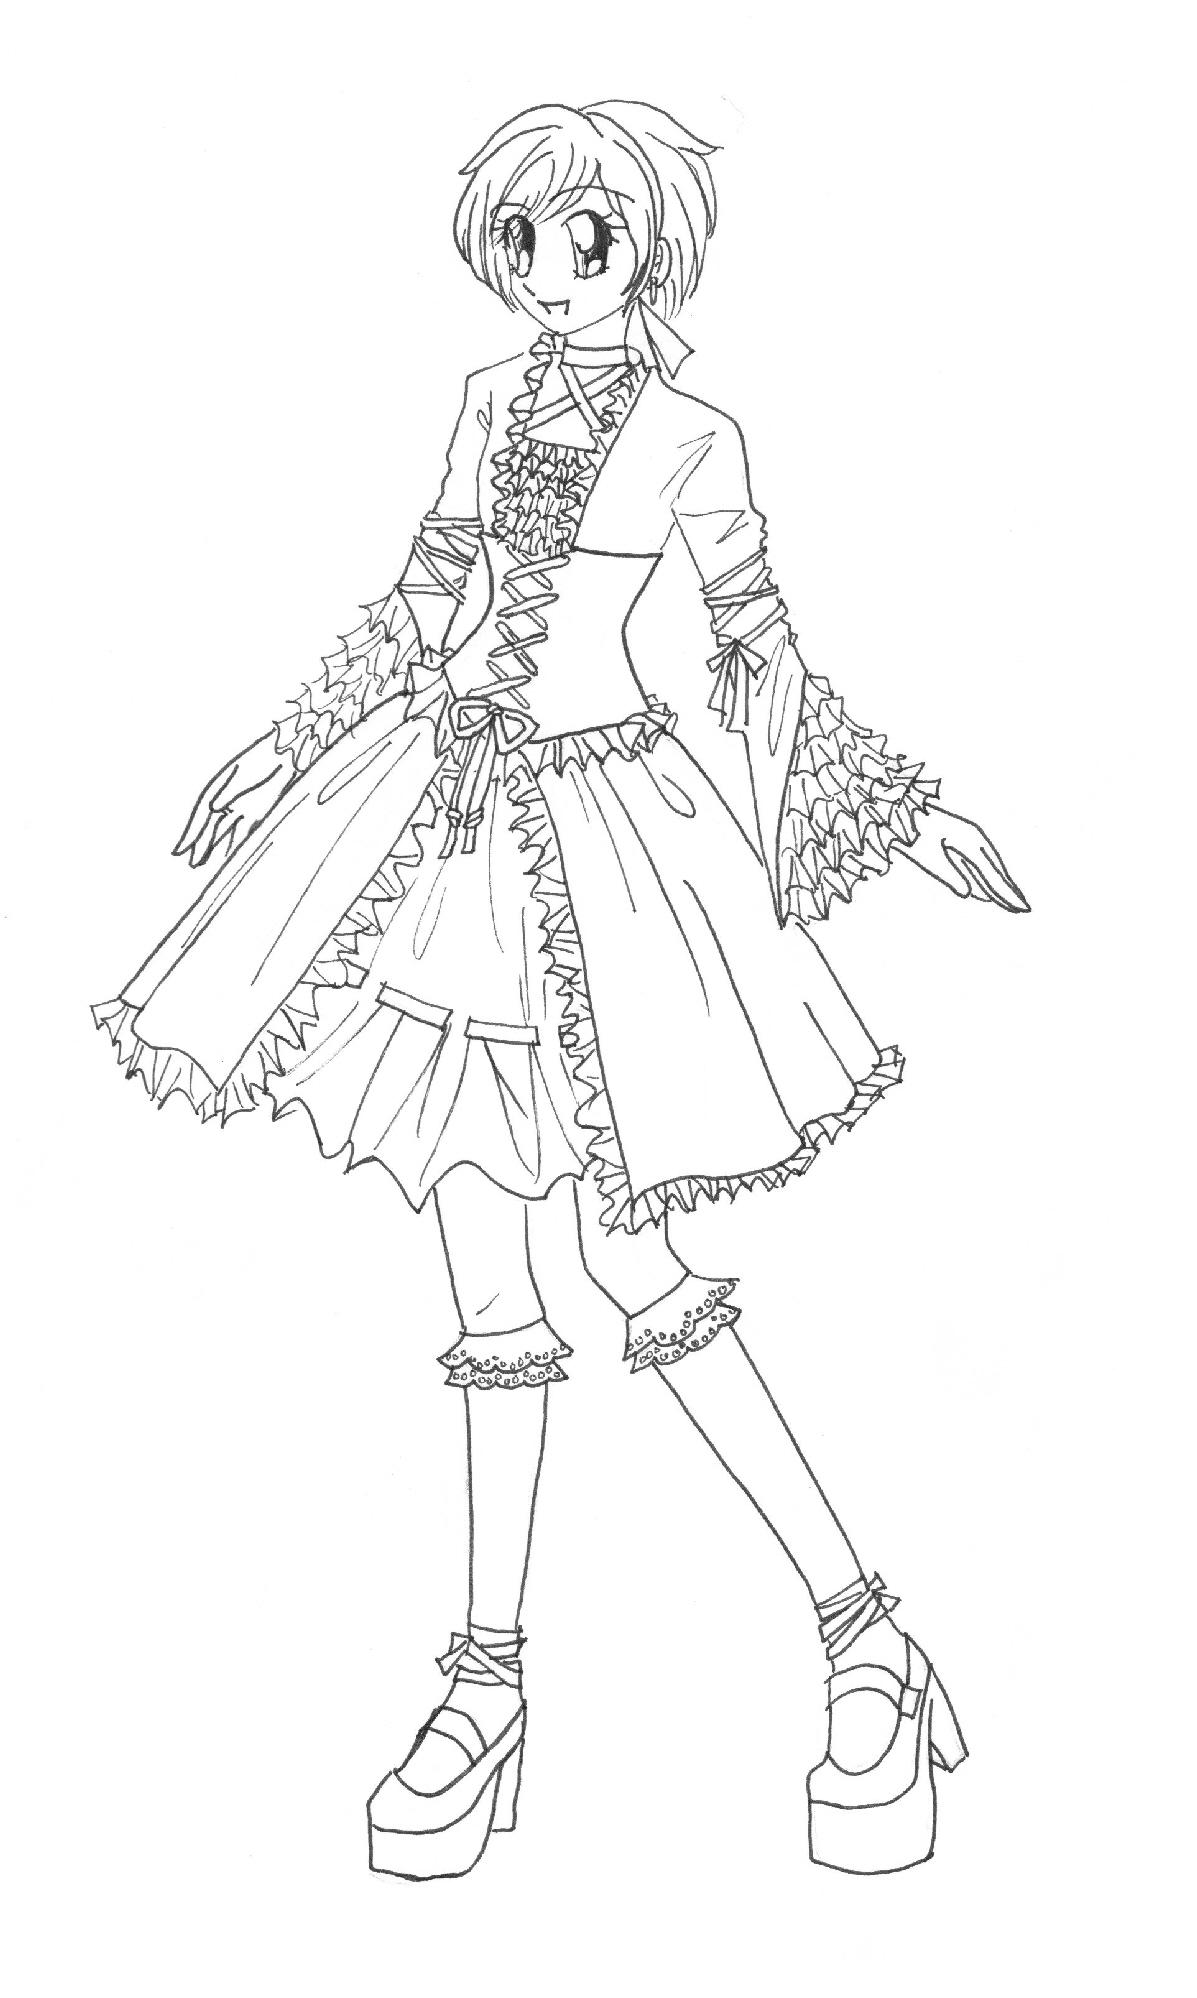 http://fc05.deviantart.net/fs28/f/2009/239/1/3/lolita_design_2_by_joongieluvr101.jpg